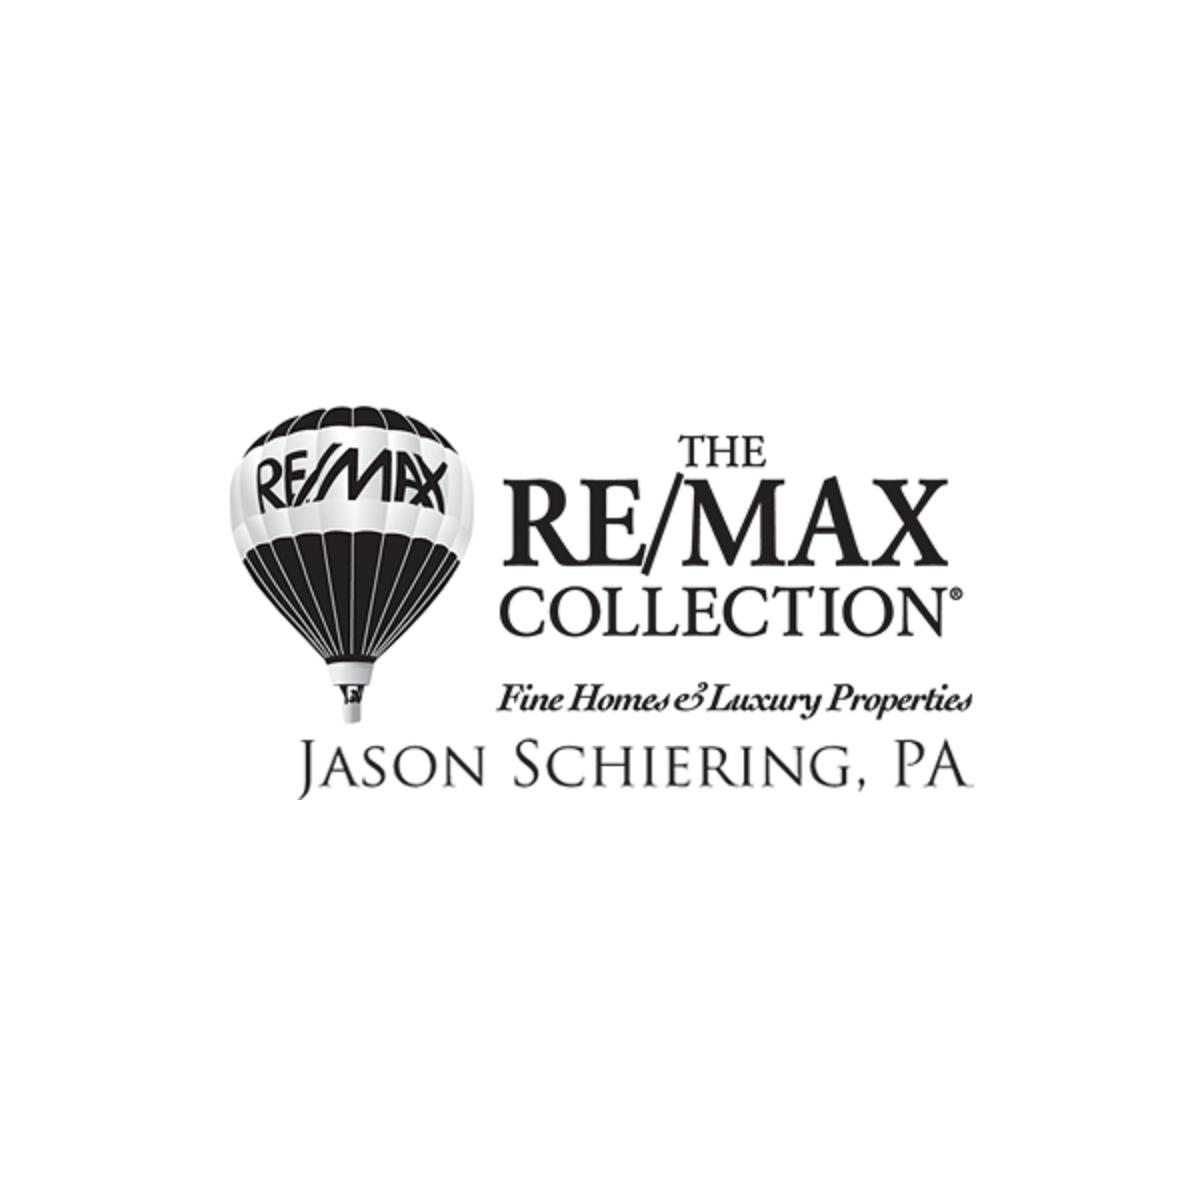 Jason Schiering PA